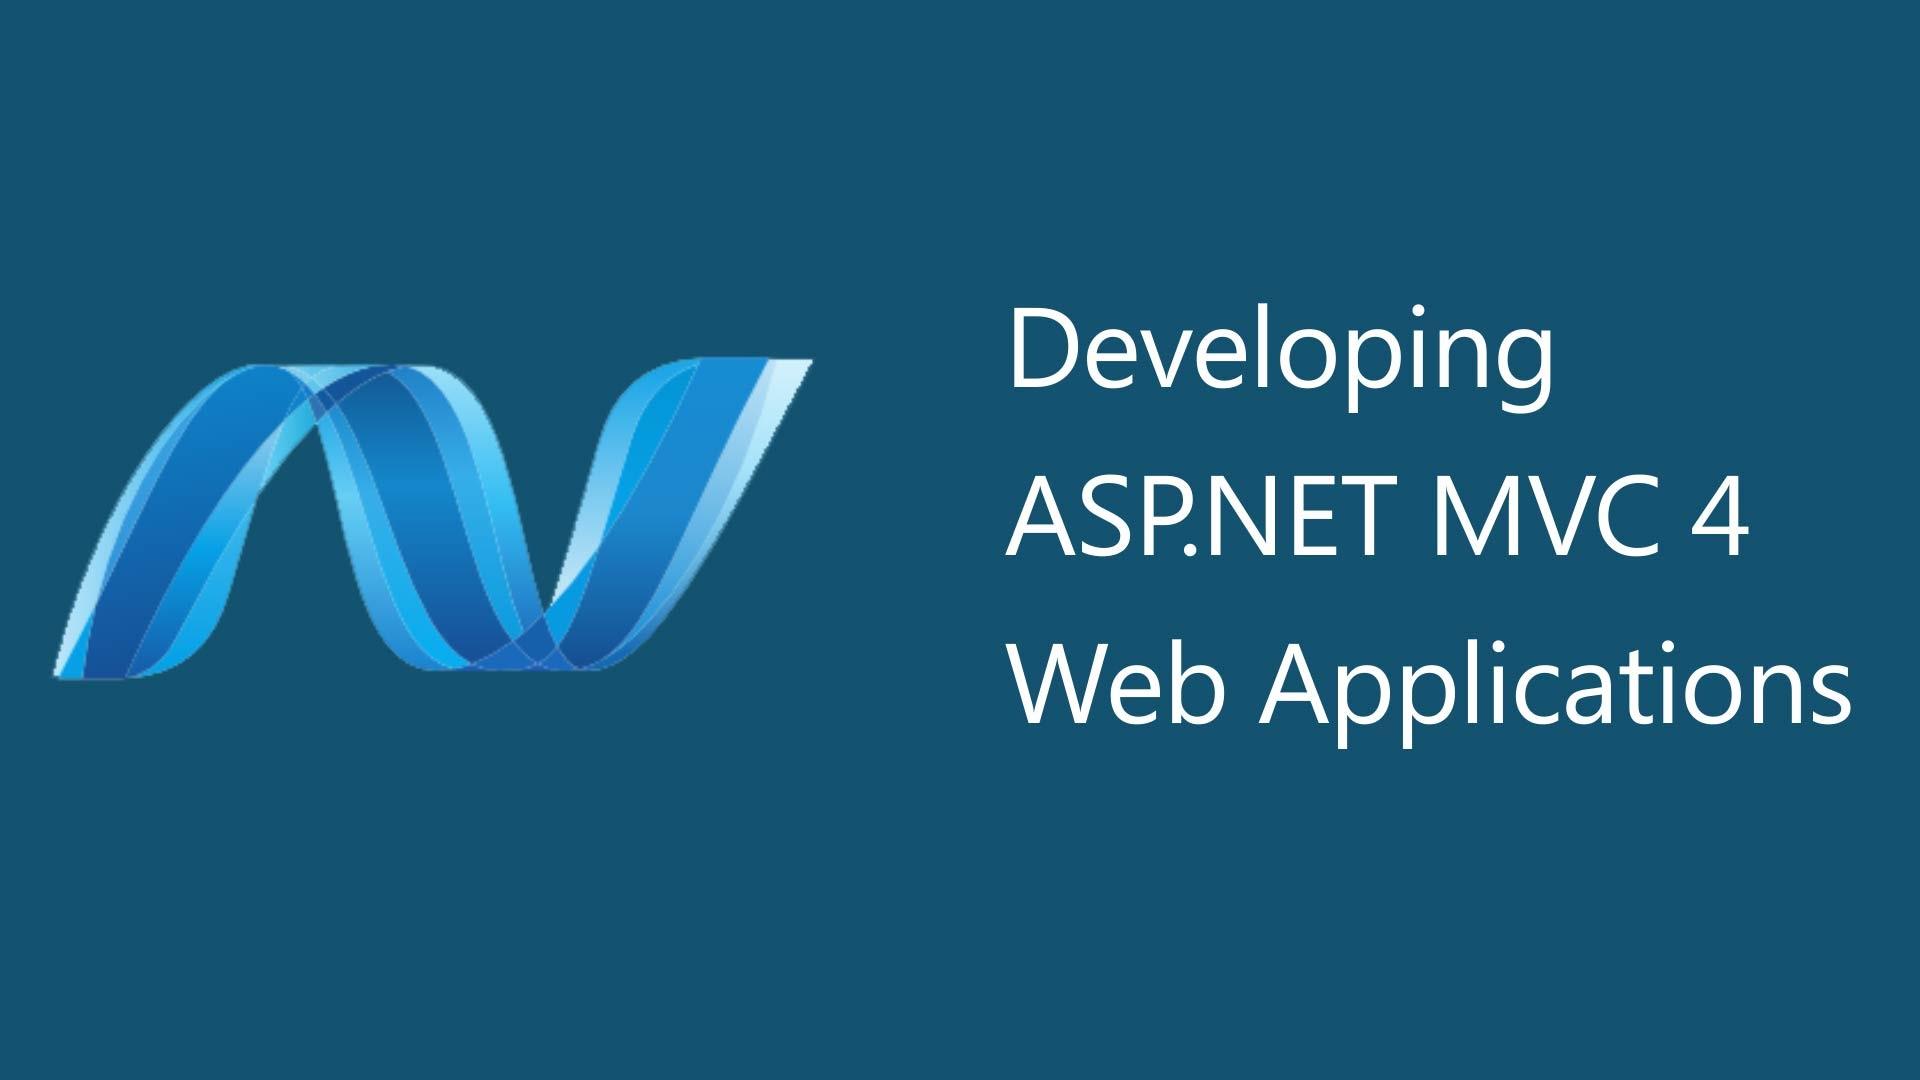 MVC 4 web applications